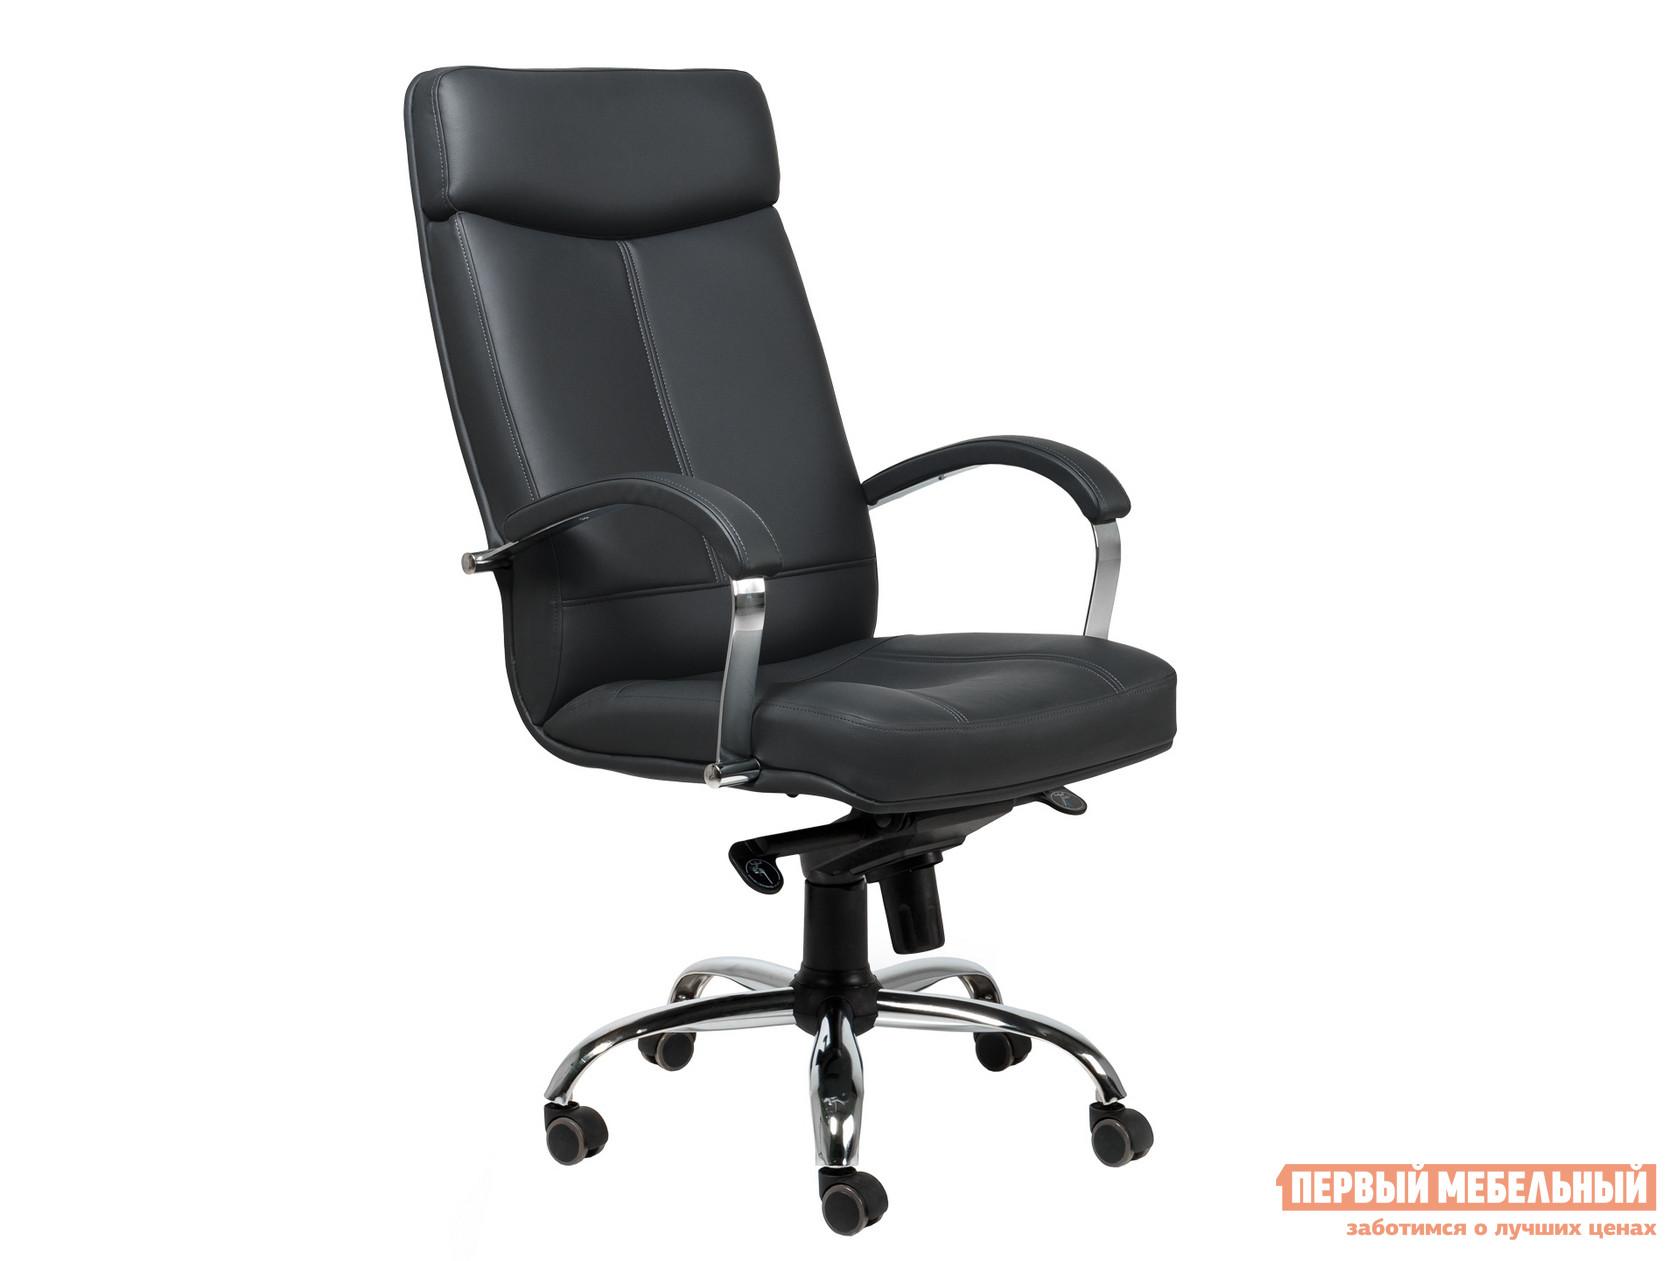 Кресло руководителя Pointex Gloria chrome A компьютерное кресло bels orion steel chrome le a